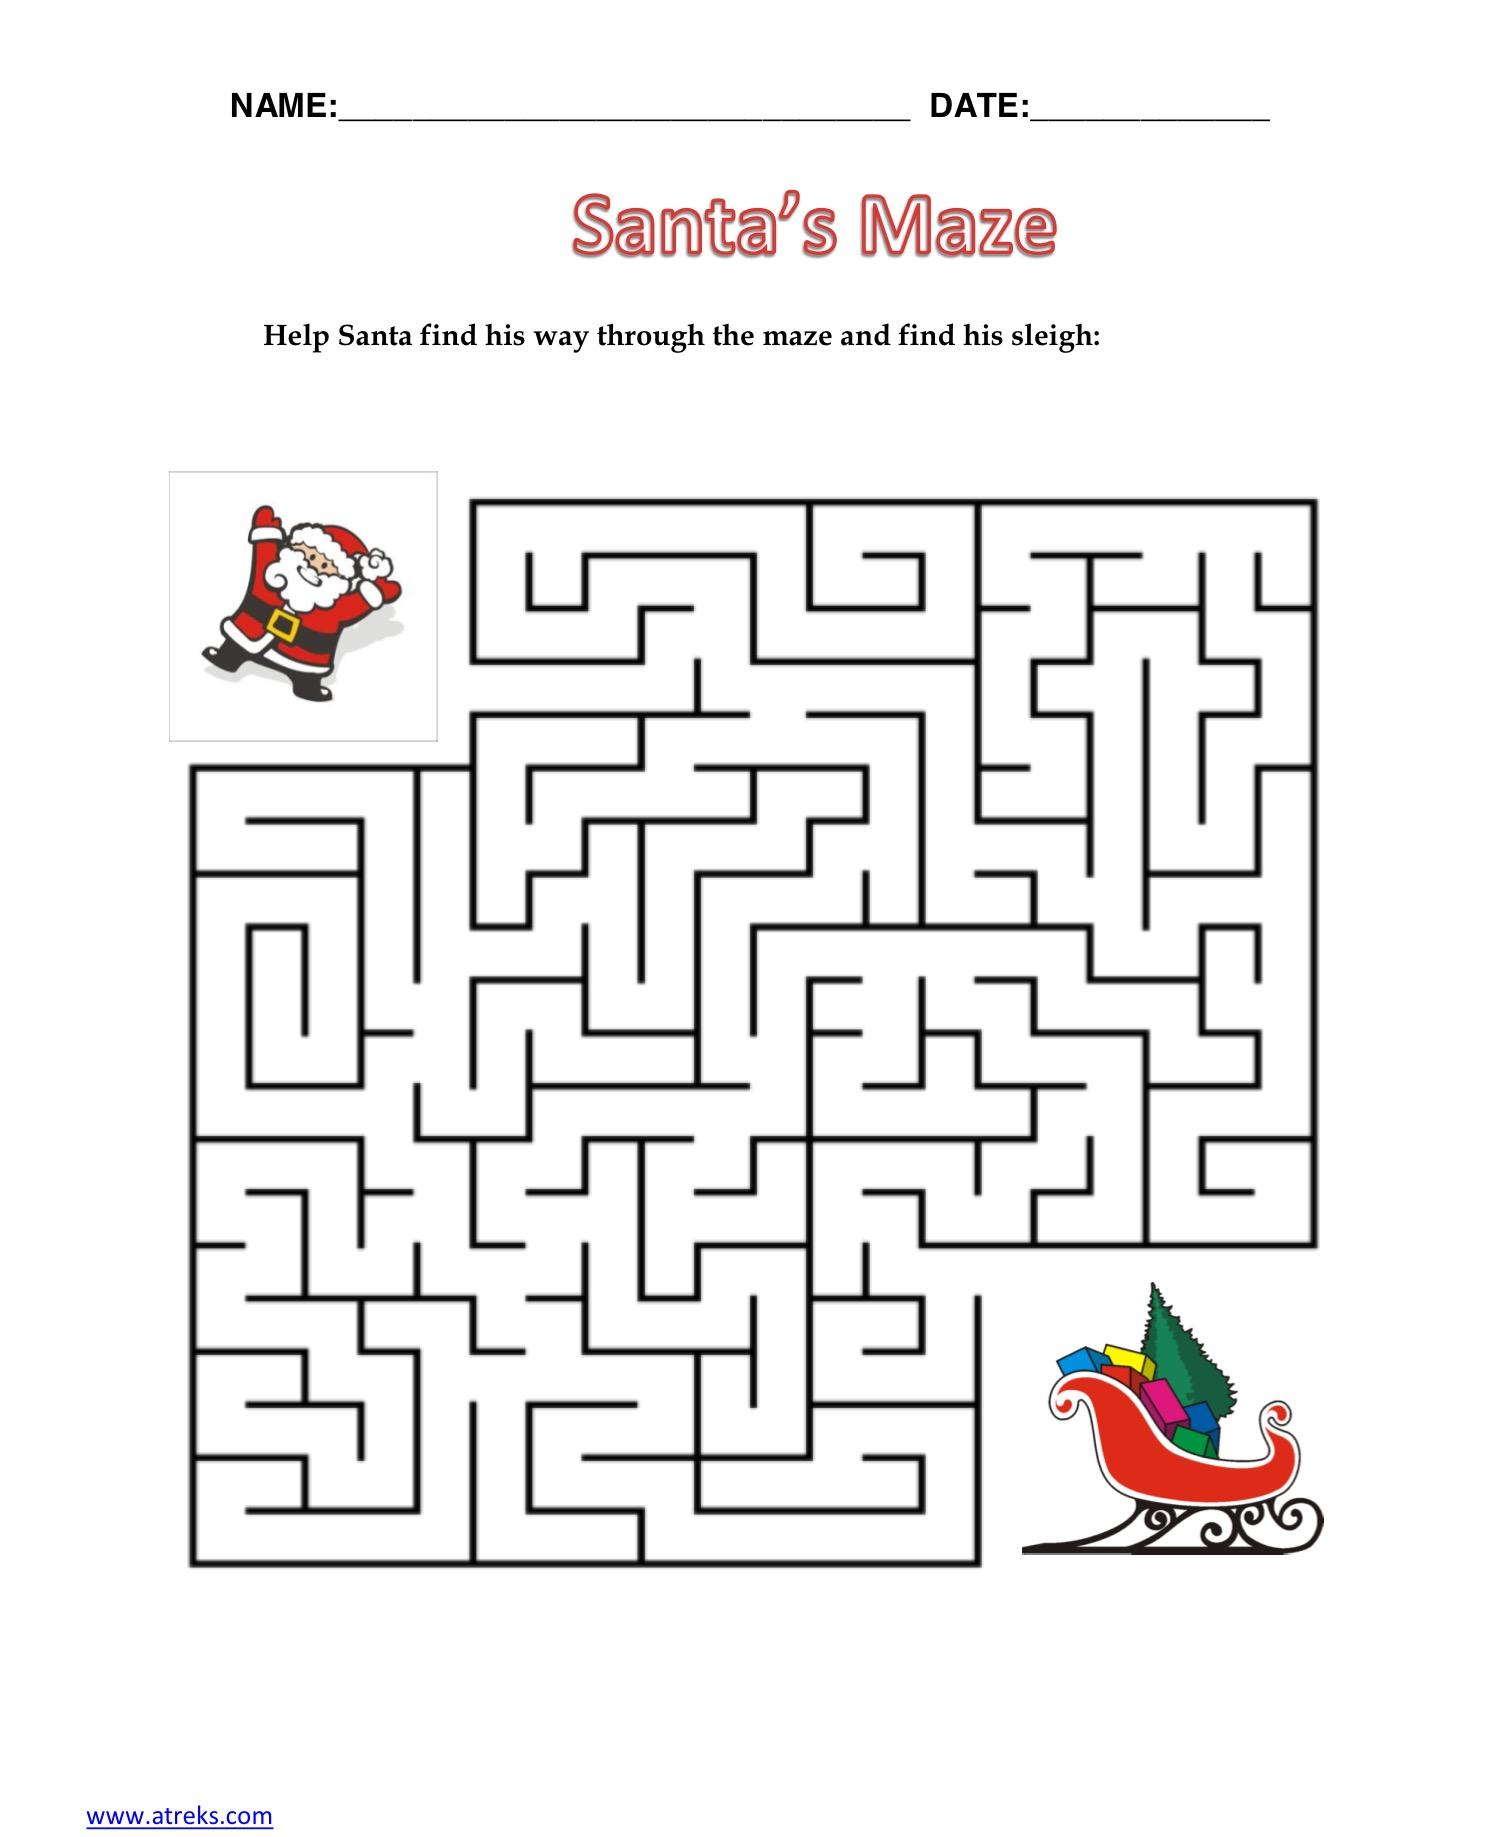 Santa's Maze